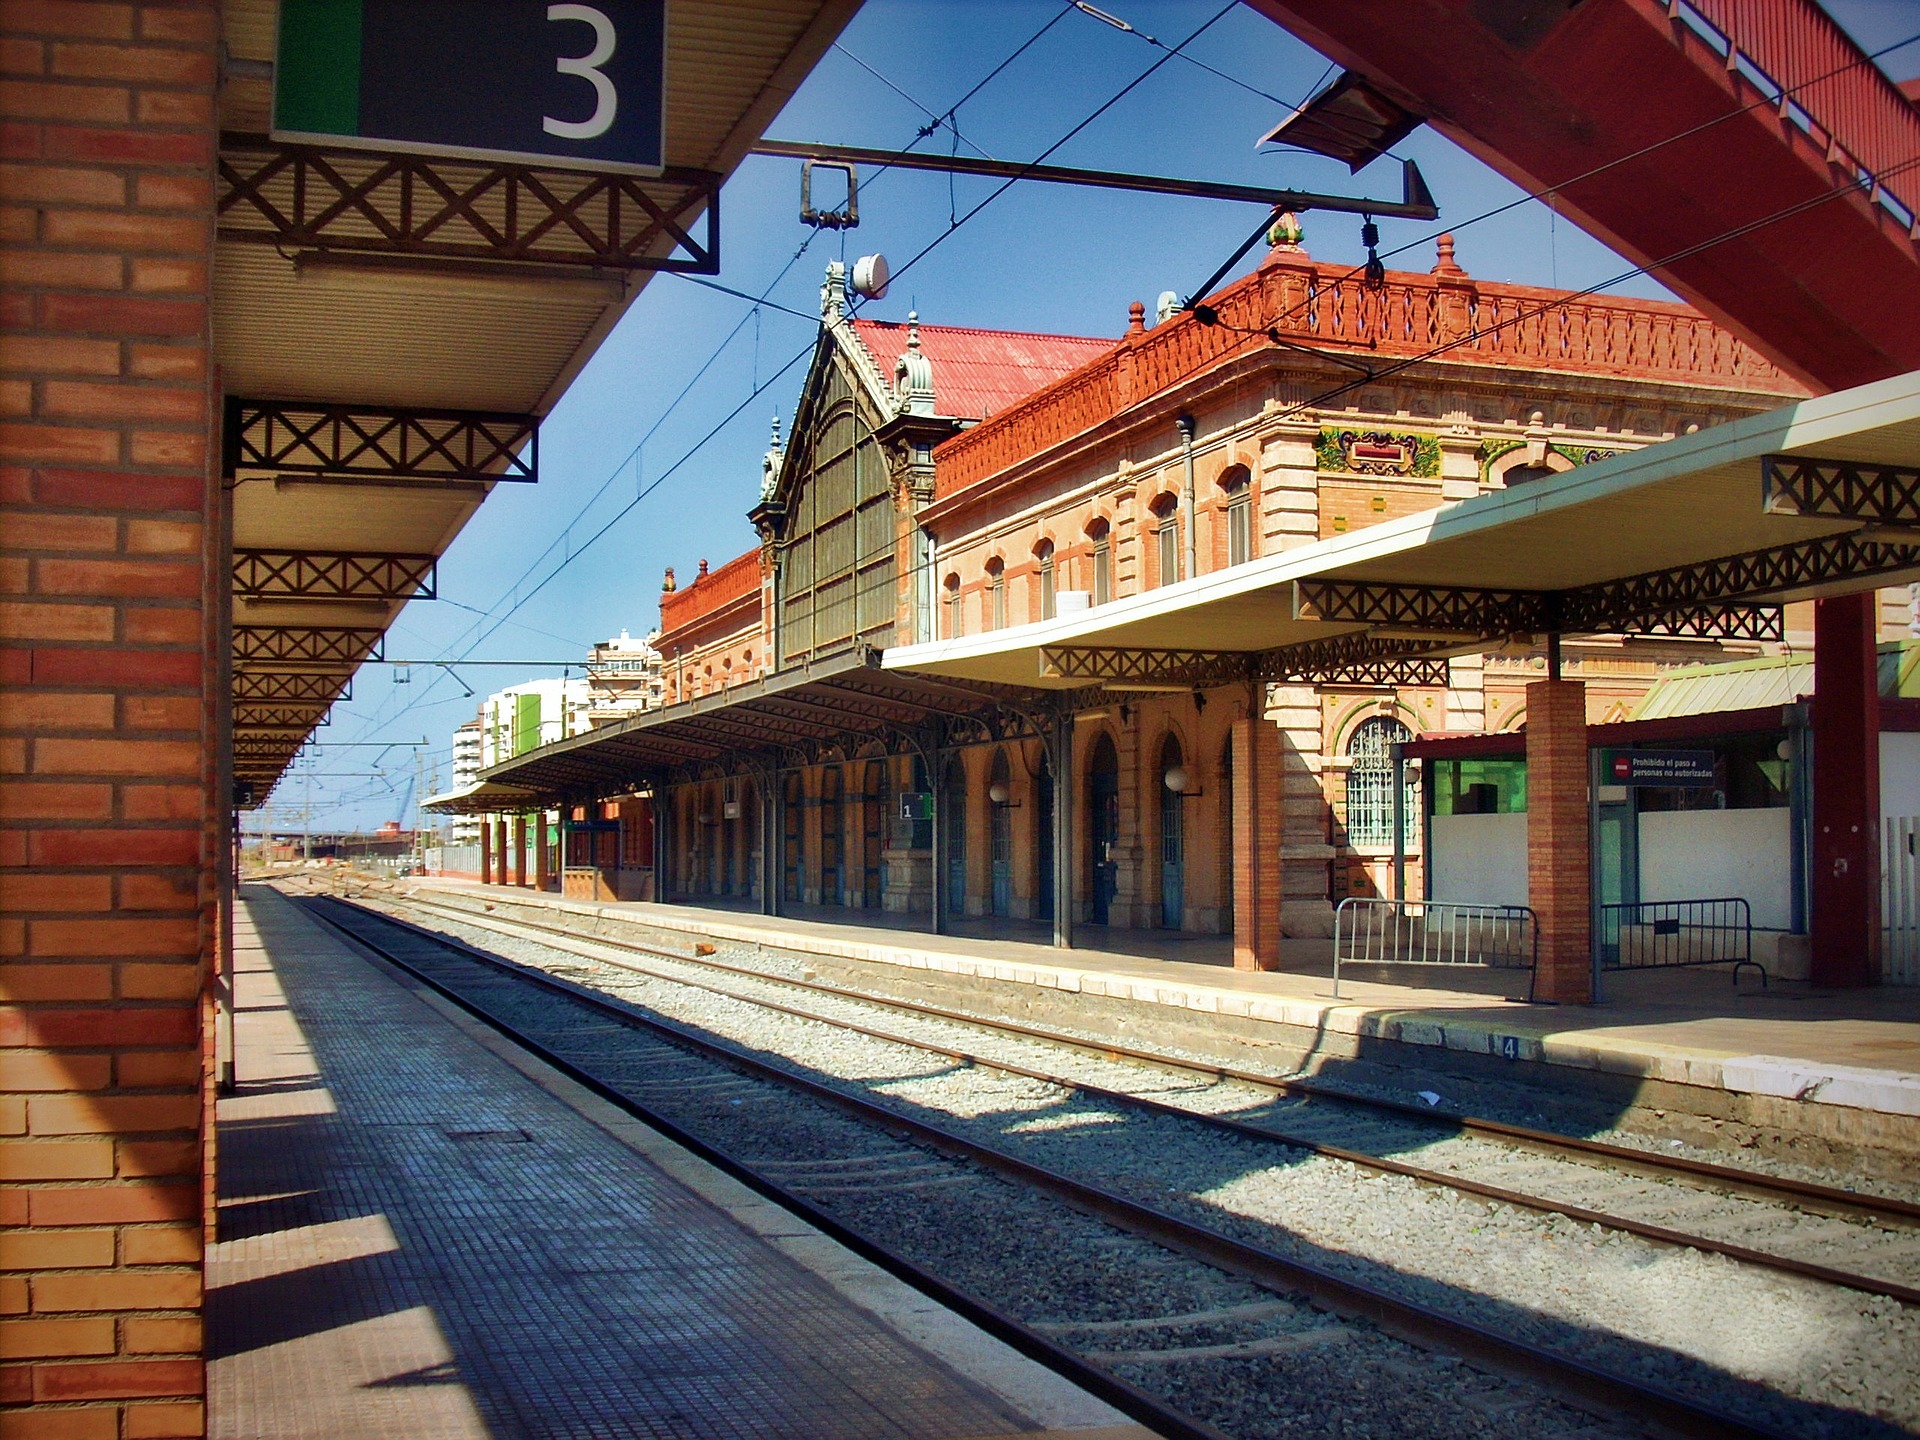 almeria-train-station--pixabay-212243_1920.jpg